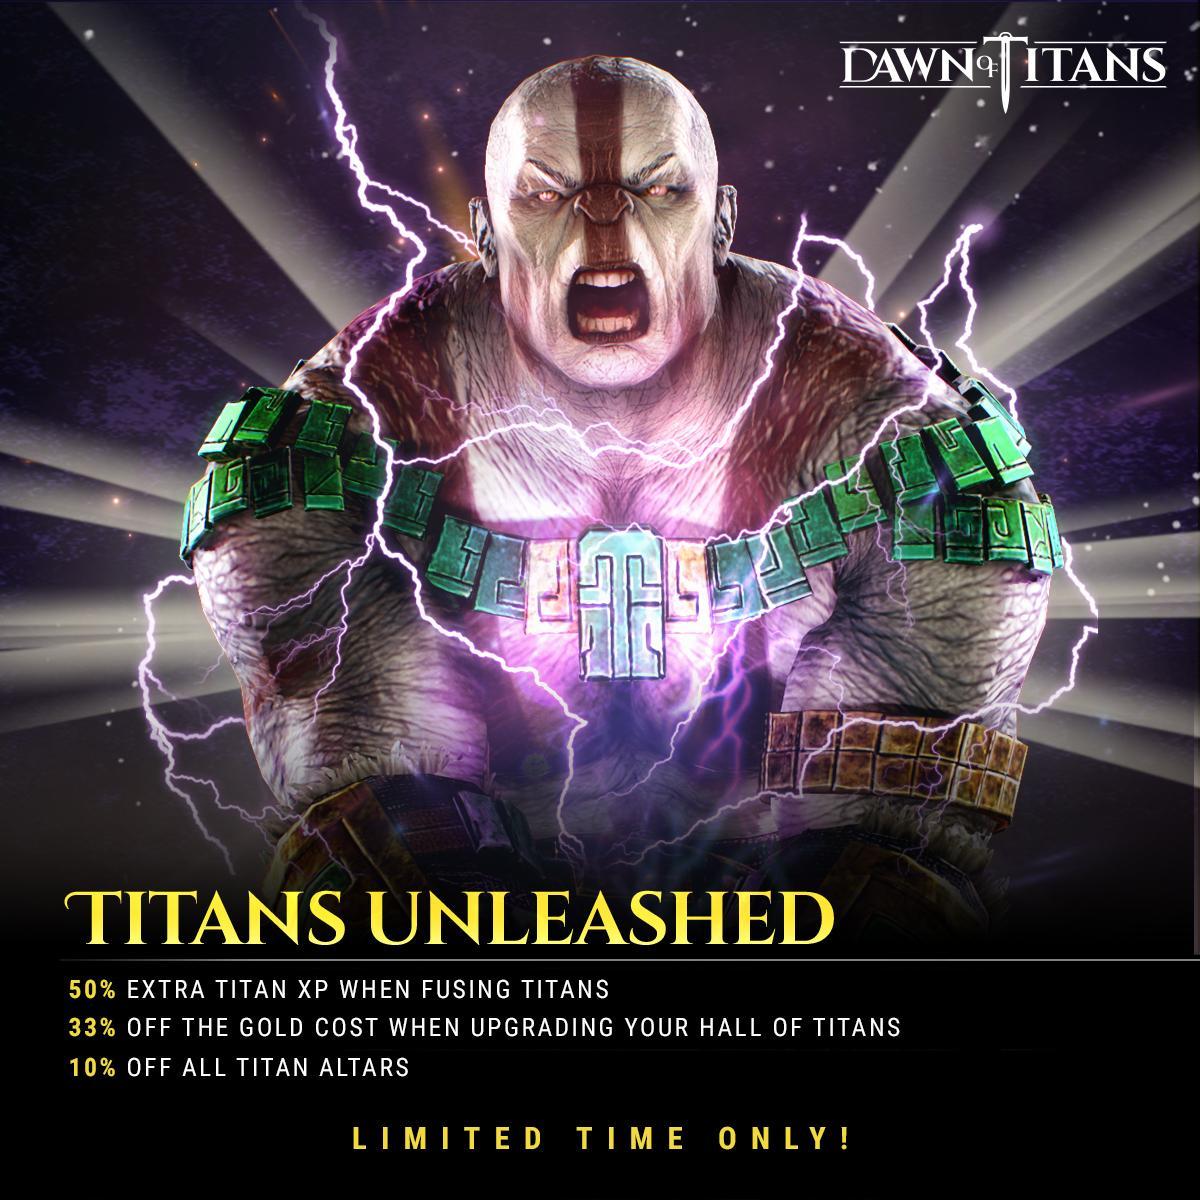 dawn of titans strongest titan